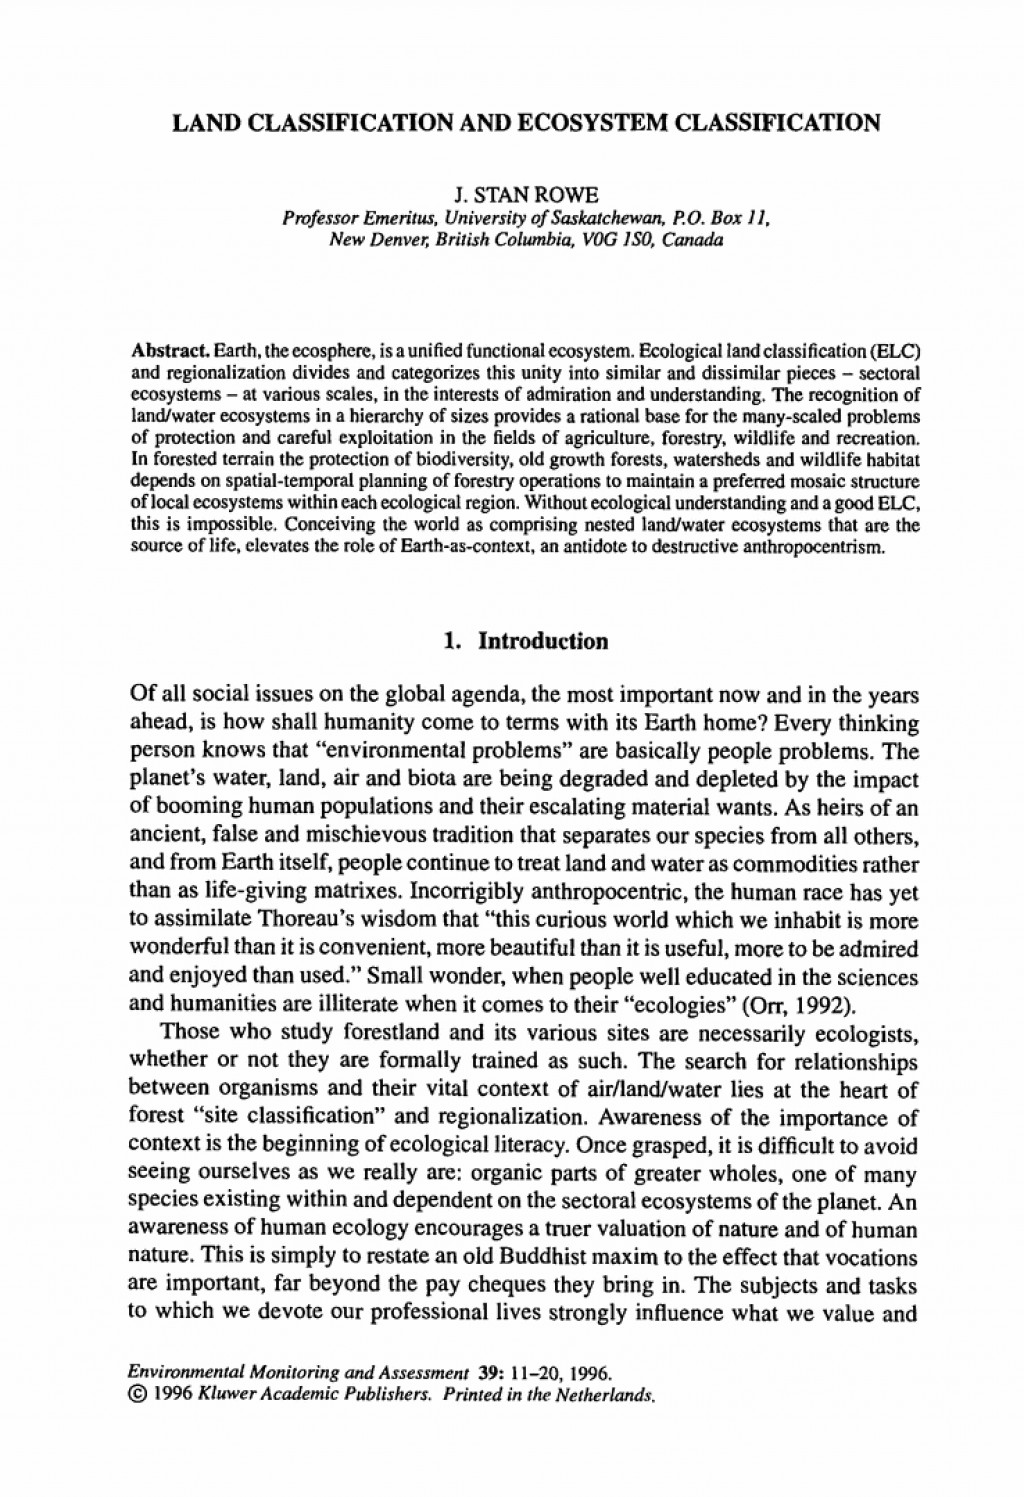 018 Environmental Protection Essay On Environment In Tamil Marathi Act Hindi Language Telugu Kannada Sanskrit Malayalam English Stupendous Pdf Large